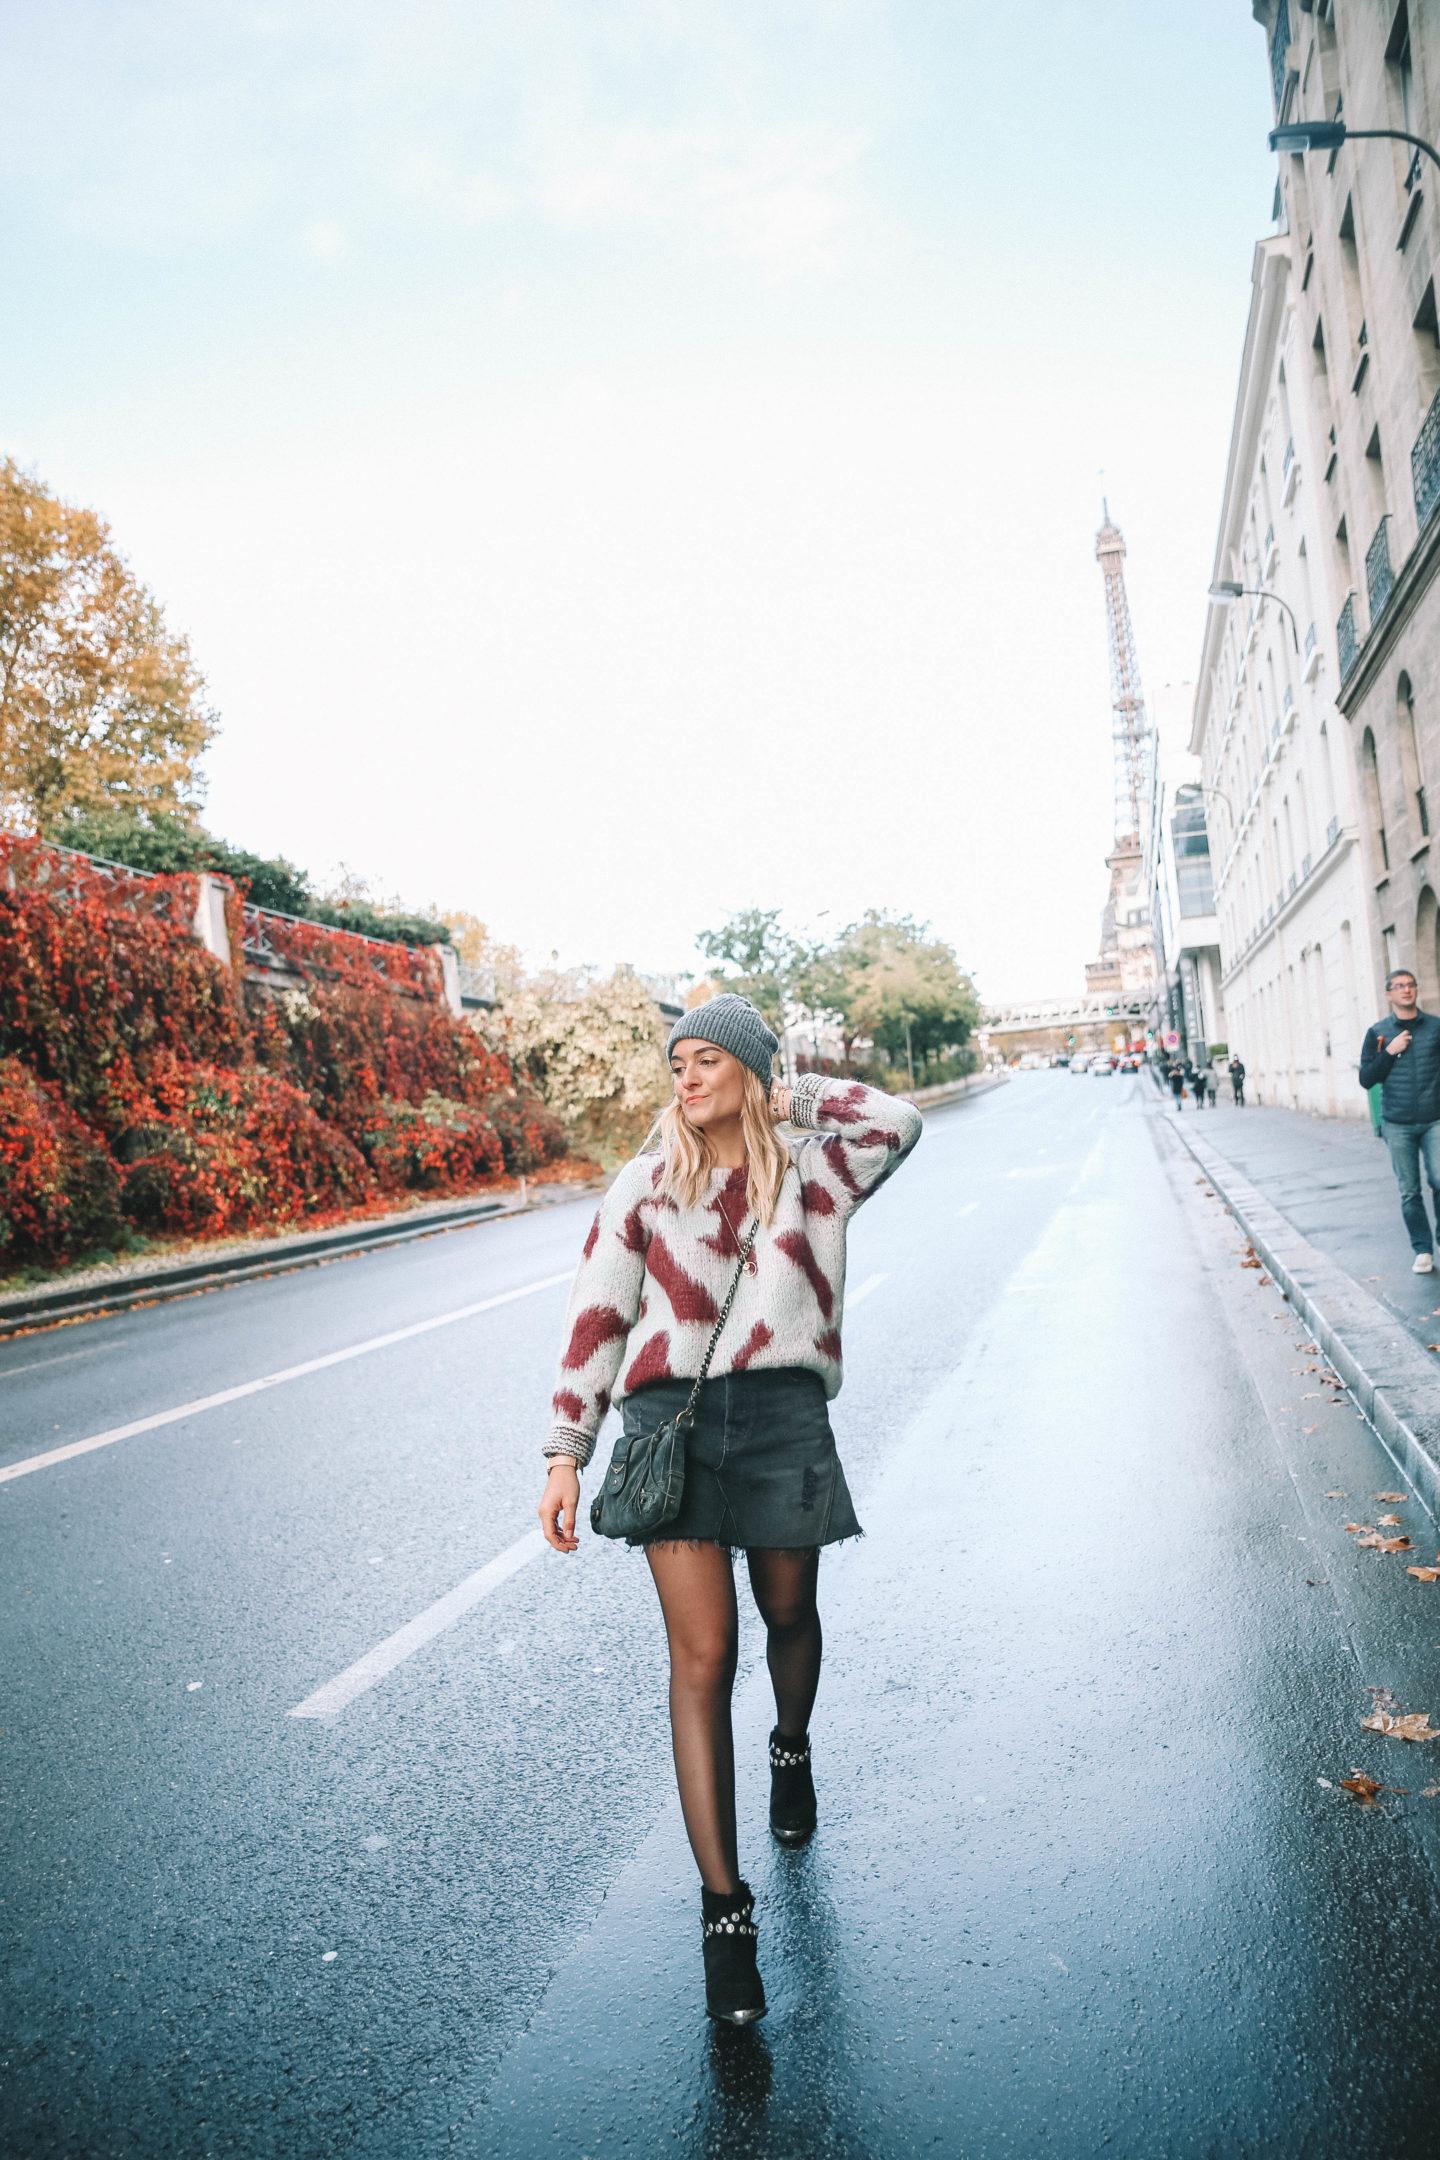 Visiter Paris - Blondie baby blog mode et voyages